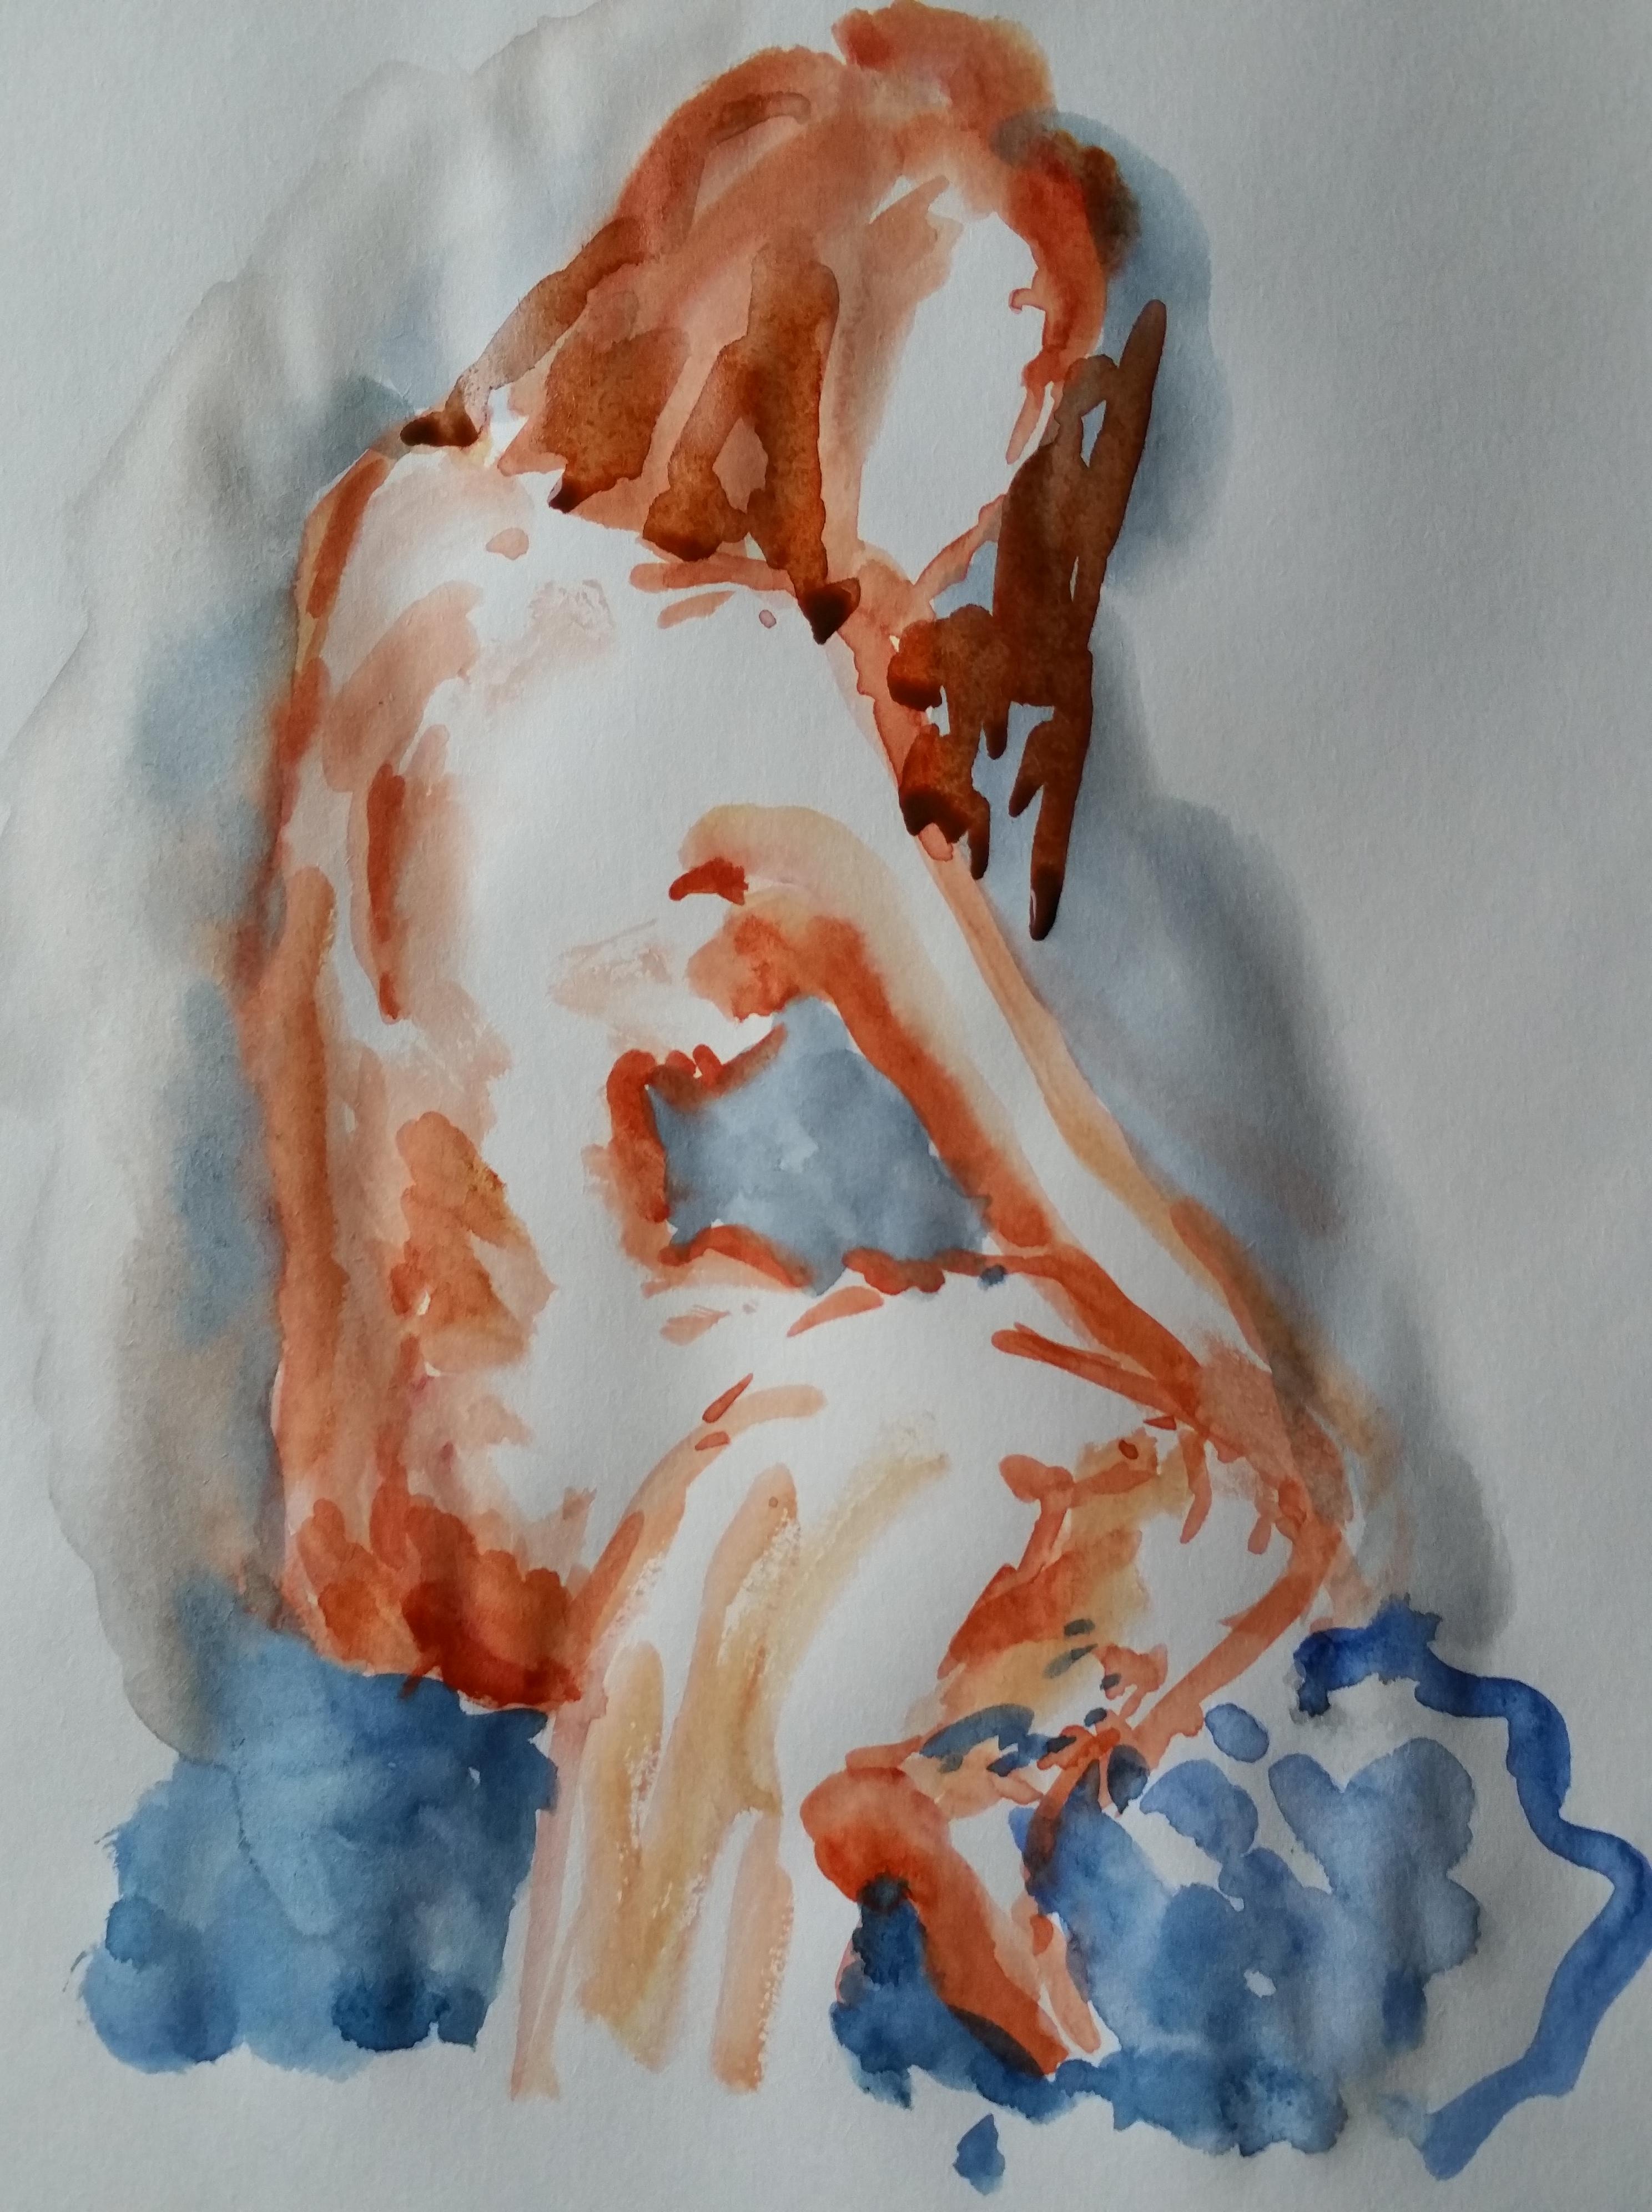 Dessin aquarelle orang� bleu femme nu trois quarts dos  cours de dessin